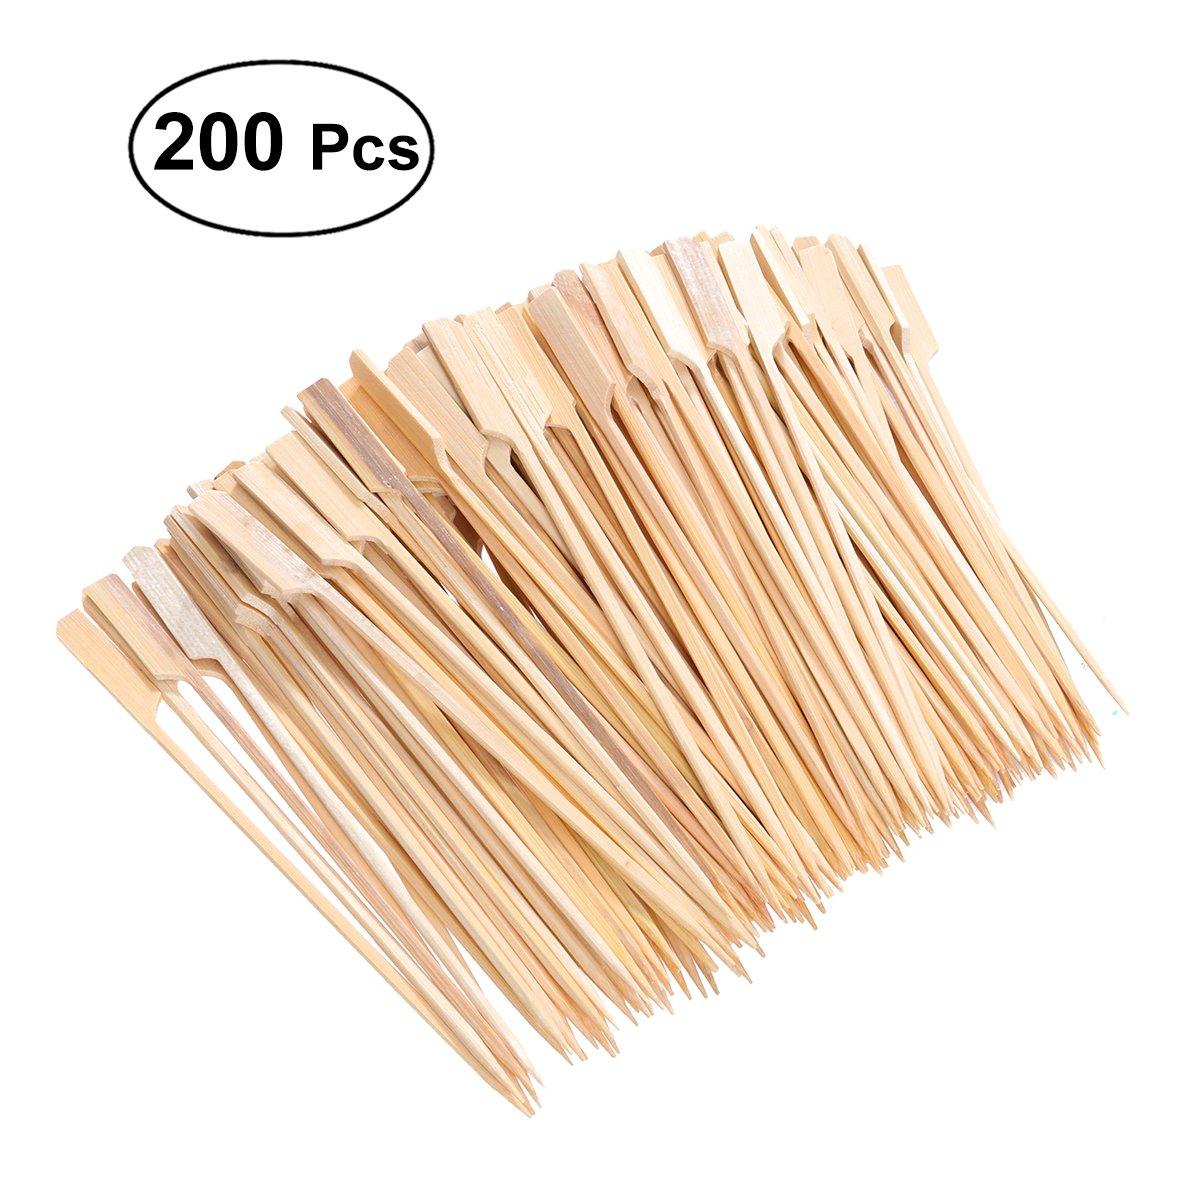 BESTONZON 200Pcs Bamboo Picks Paddle Skewers//Fruit Picks//Mini Cocktail Forks,Eco-Friendly,for Fruit BBQ Use 18 cm